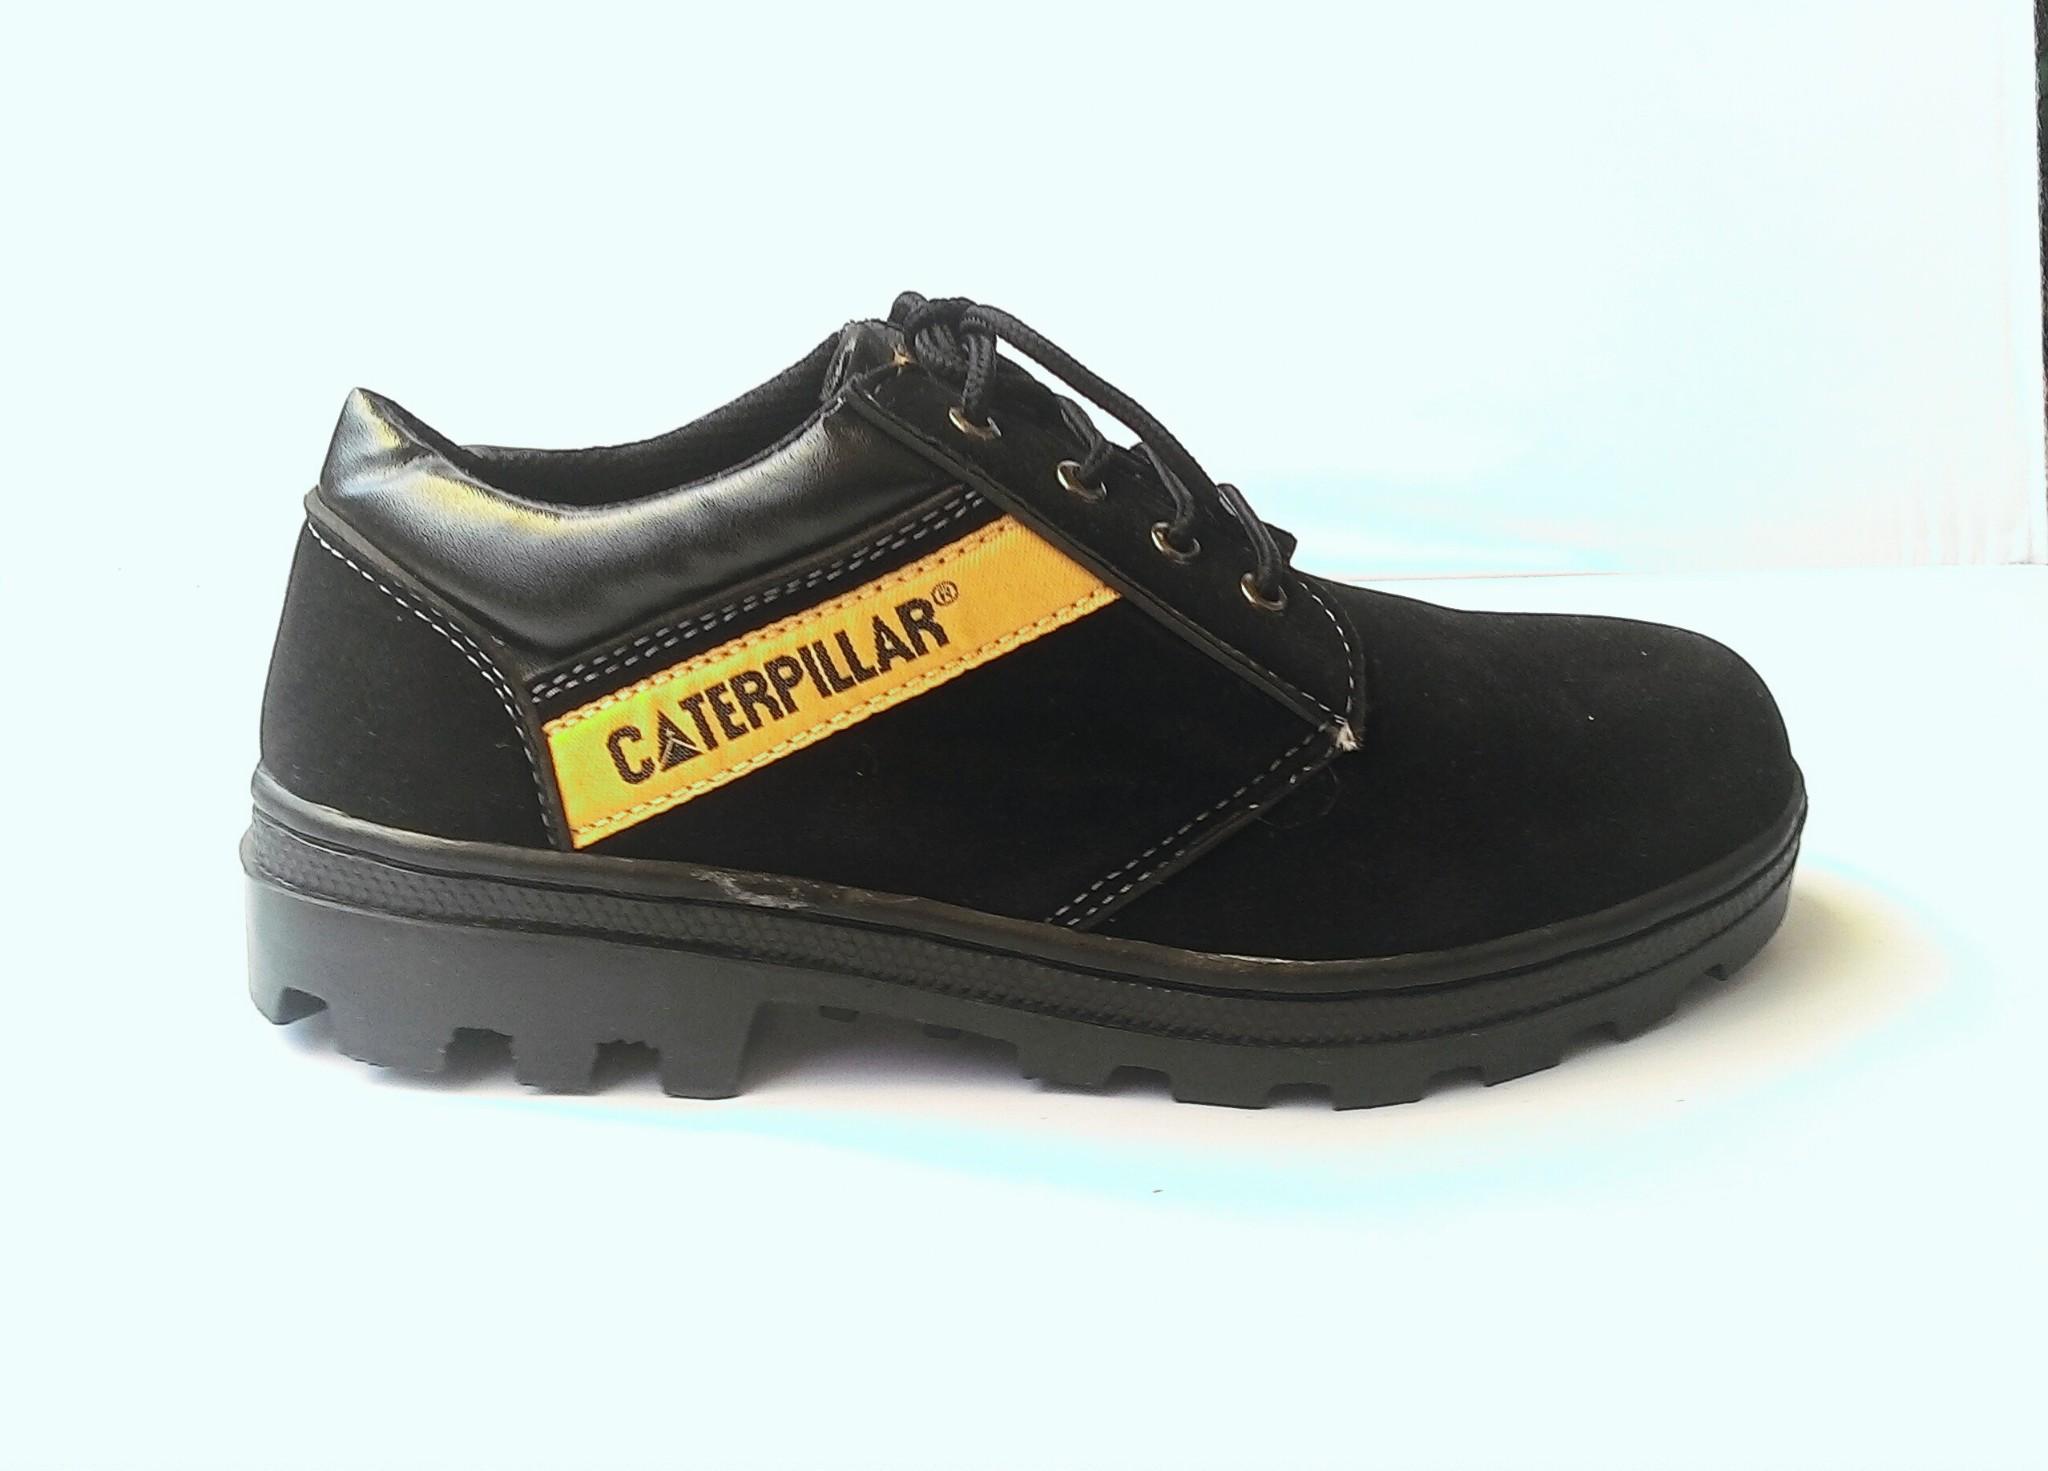 Jual Sepatu Boots Safety Caterpillar Low Warna Hitam Suede